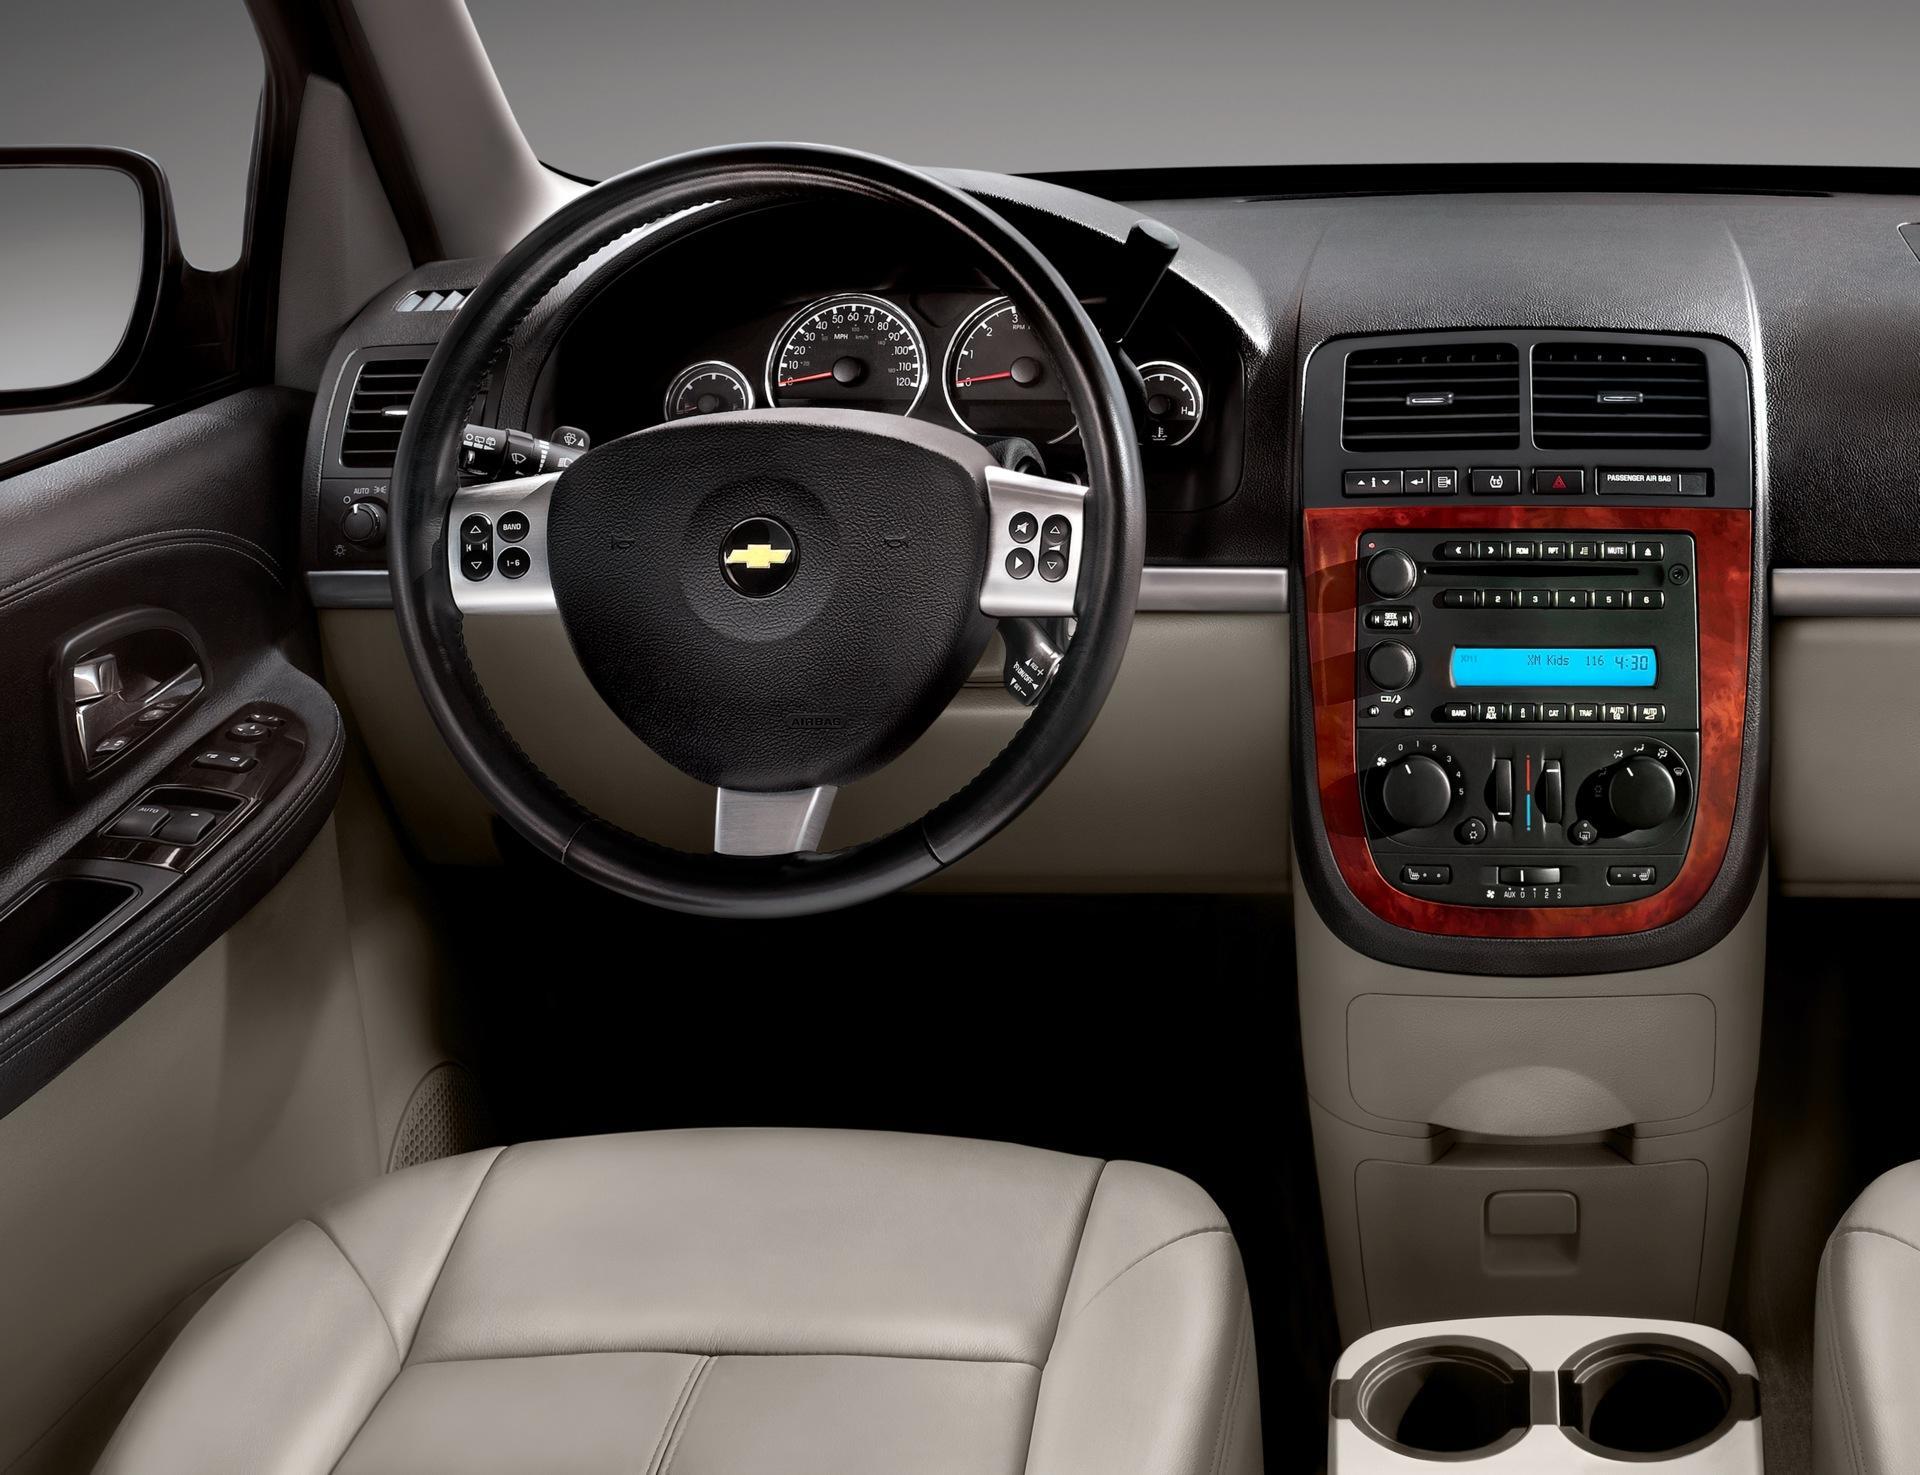 2008 Chevrolet Uplander Image. Photo 2 of 6